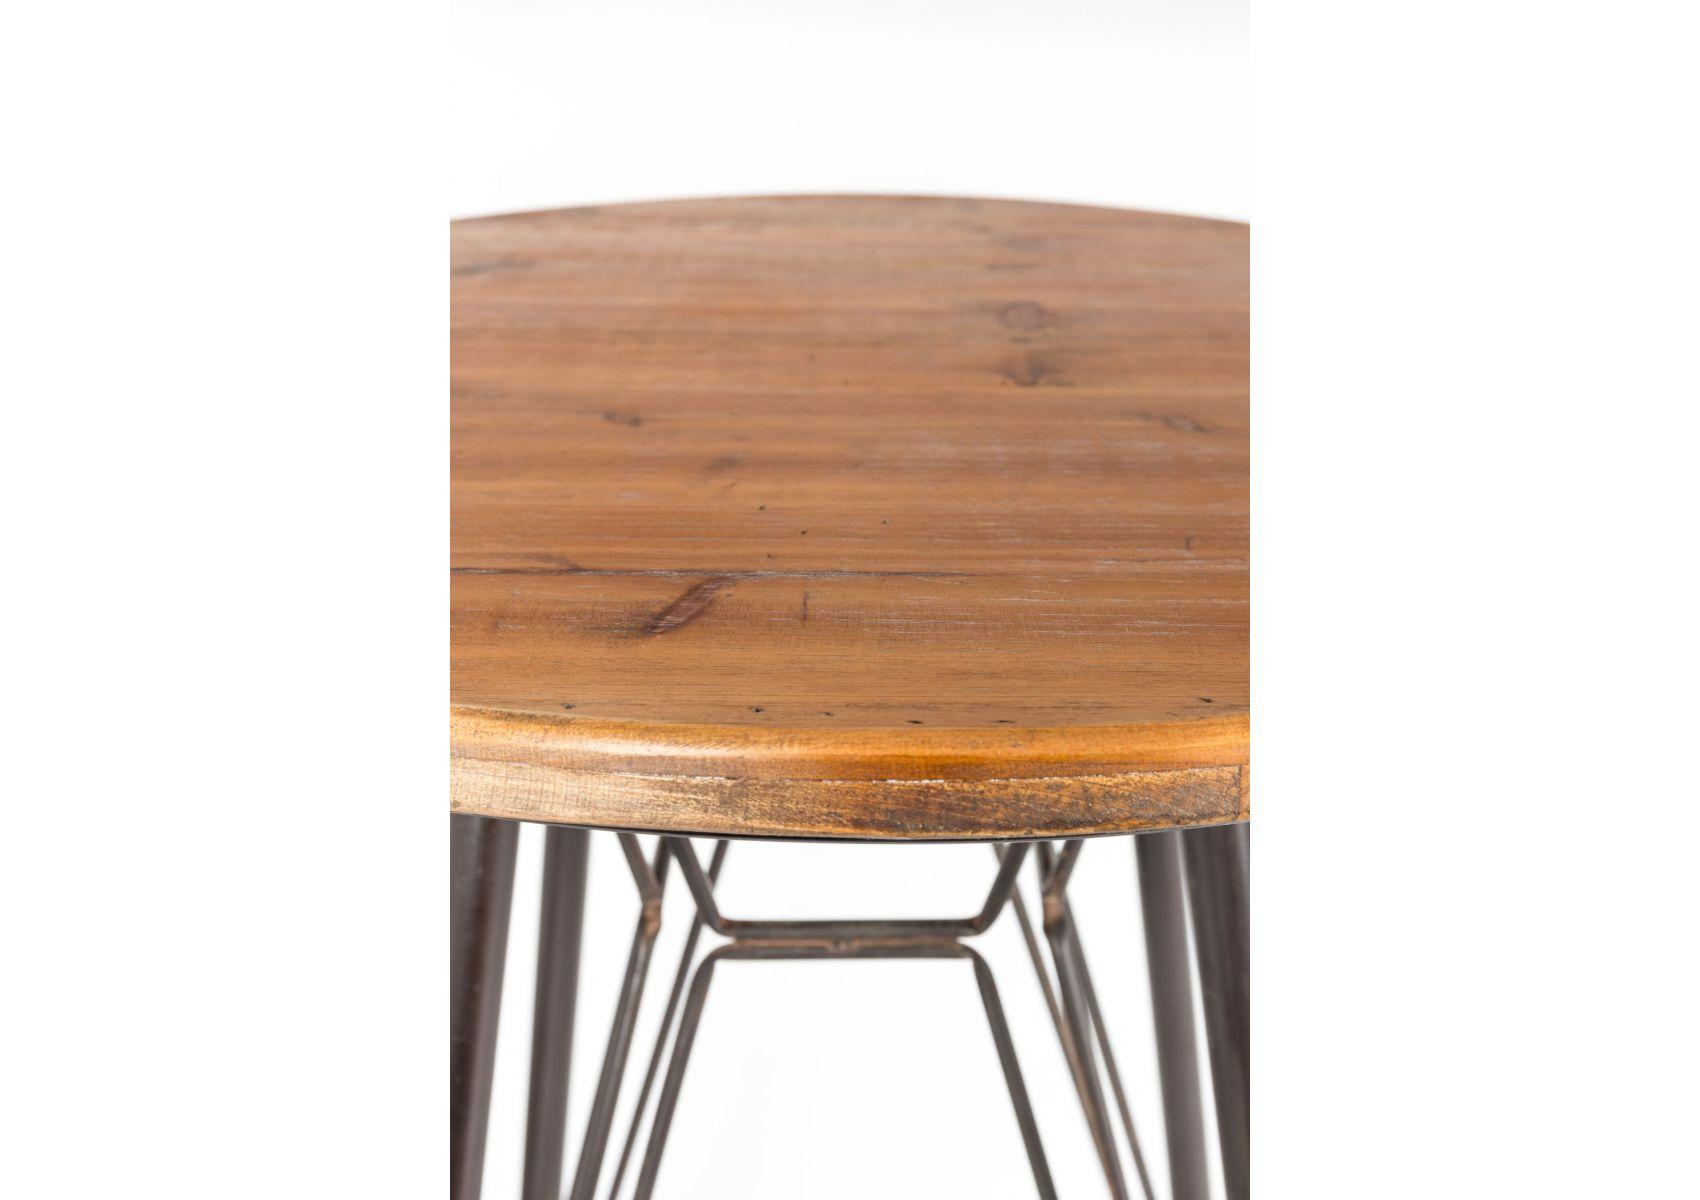 table de bar bois et m tal rouill industriel whiskey. Black Bedroom Furniture Sets. Home Design Ideas